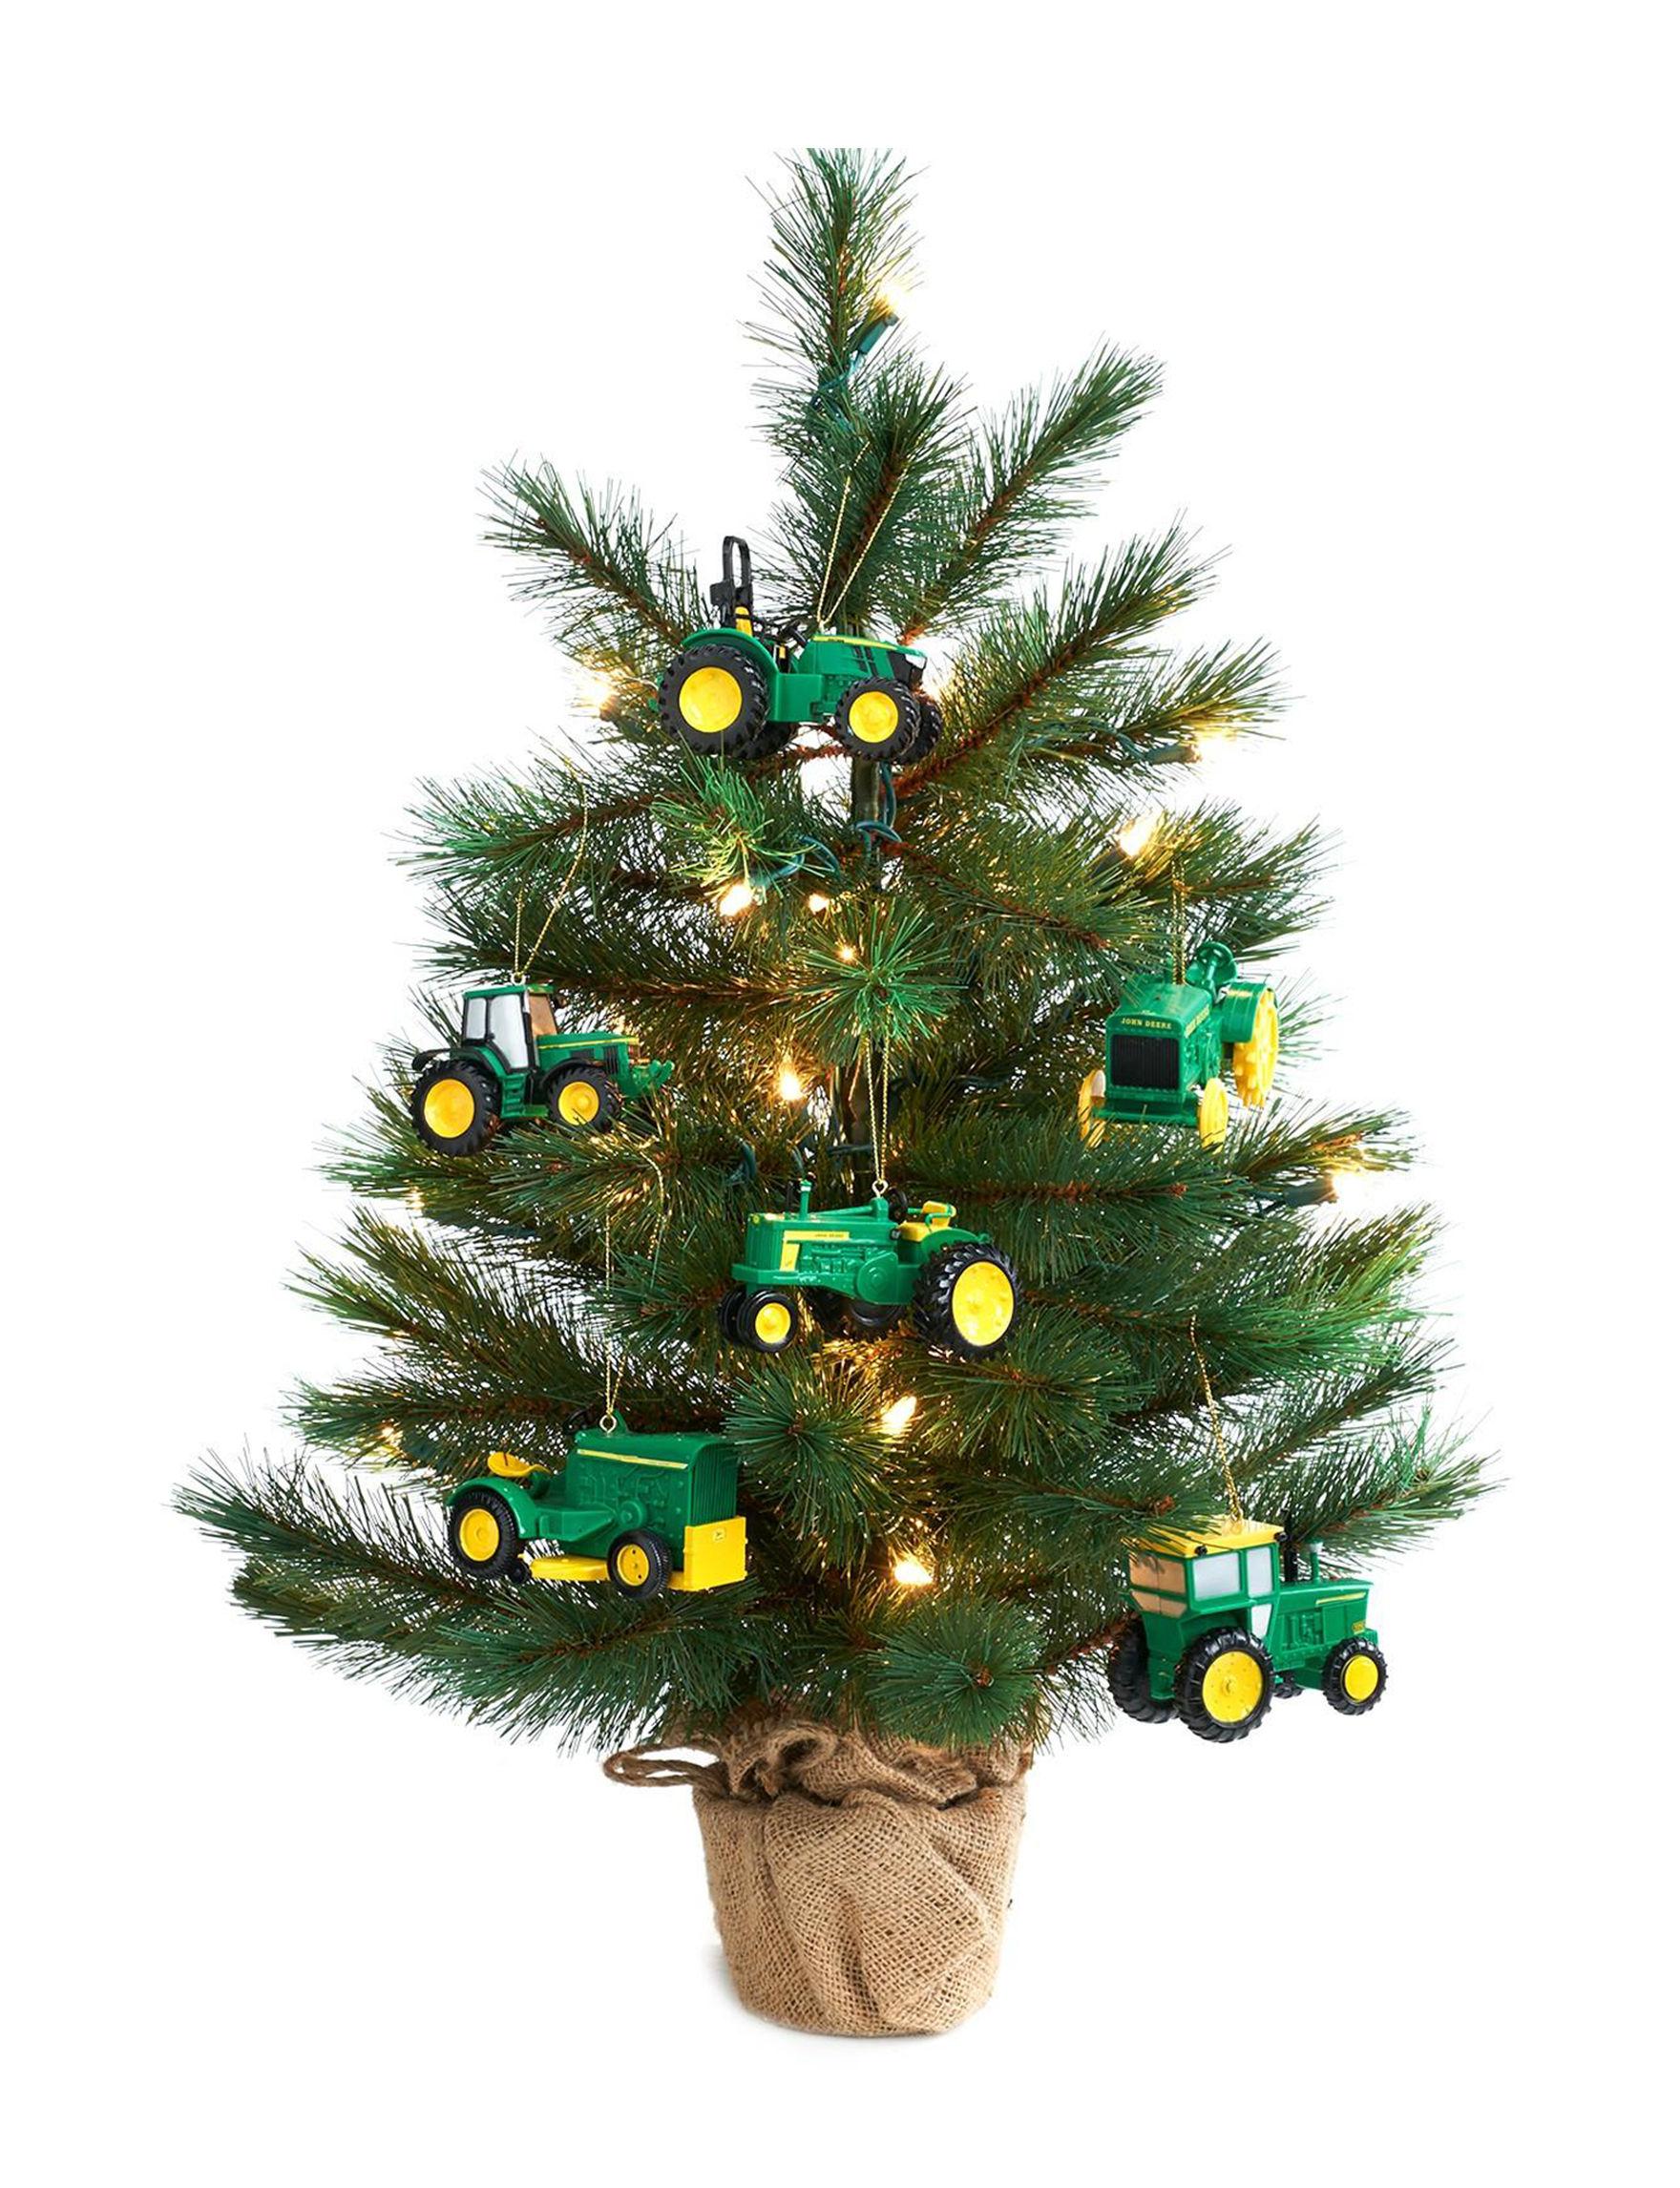 BuySeasons Green / Yellow Christmas Trees Decorative Objects Holiday Decor